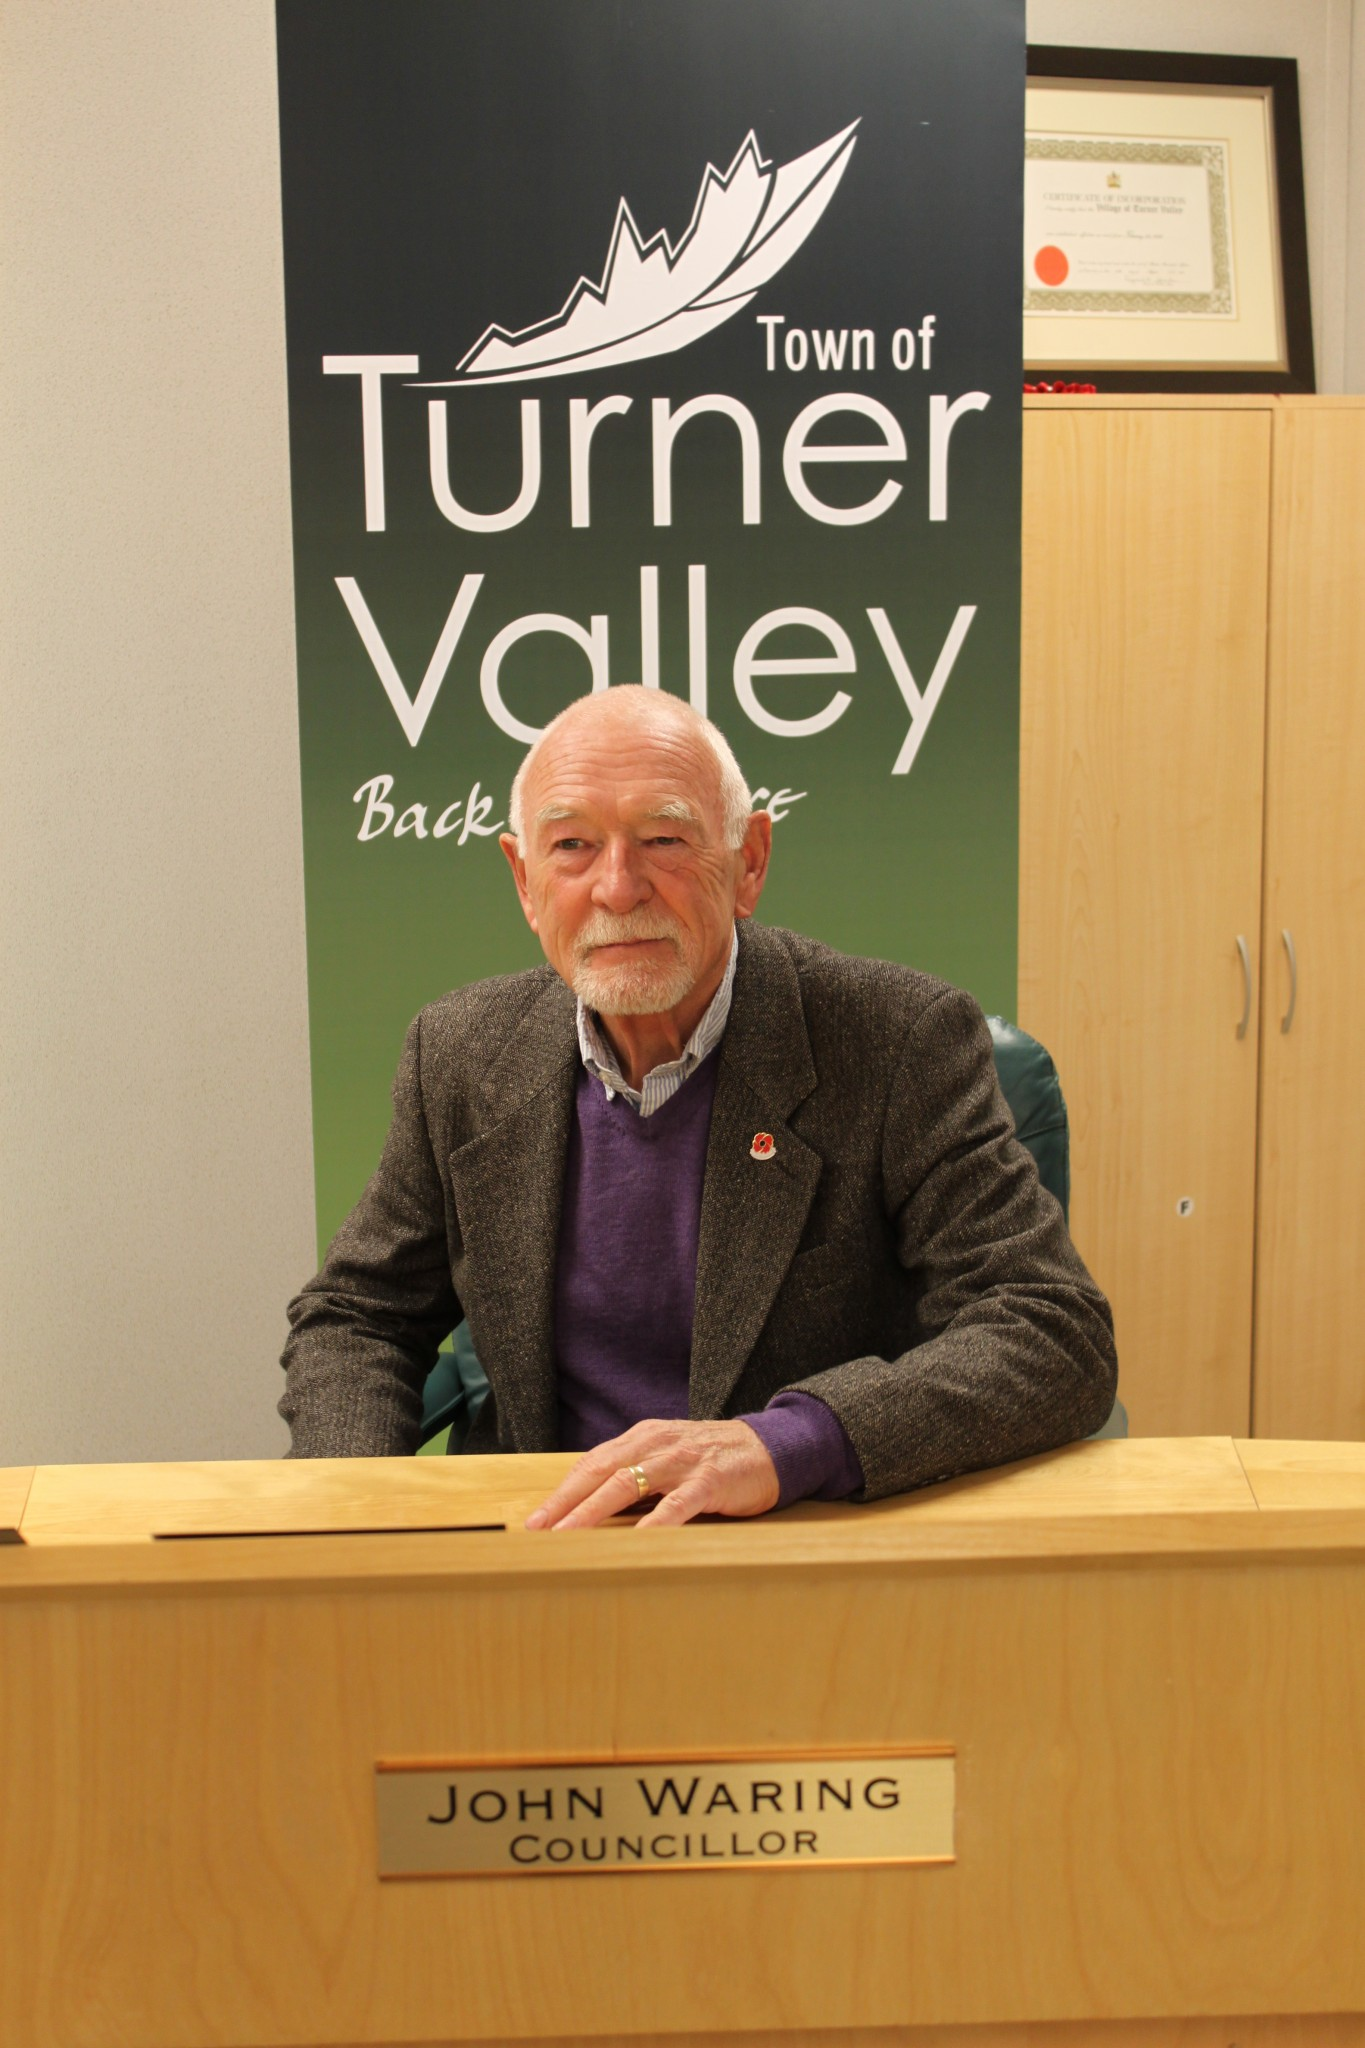 Councillor John Waring